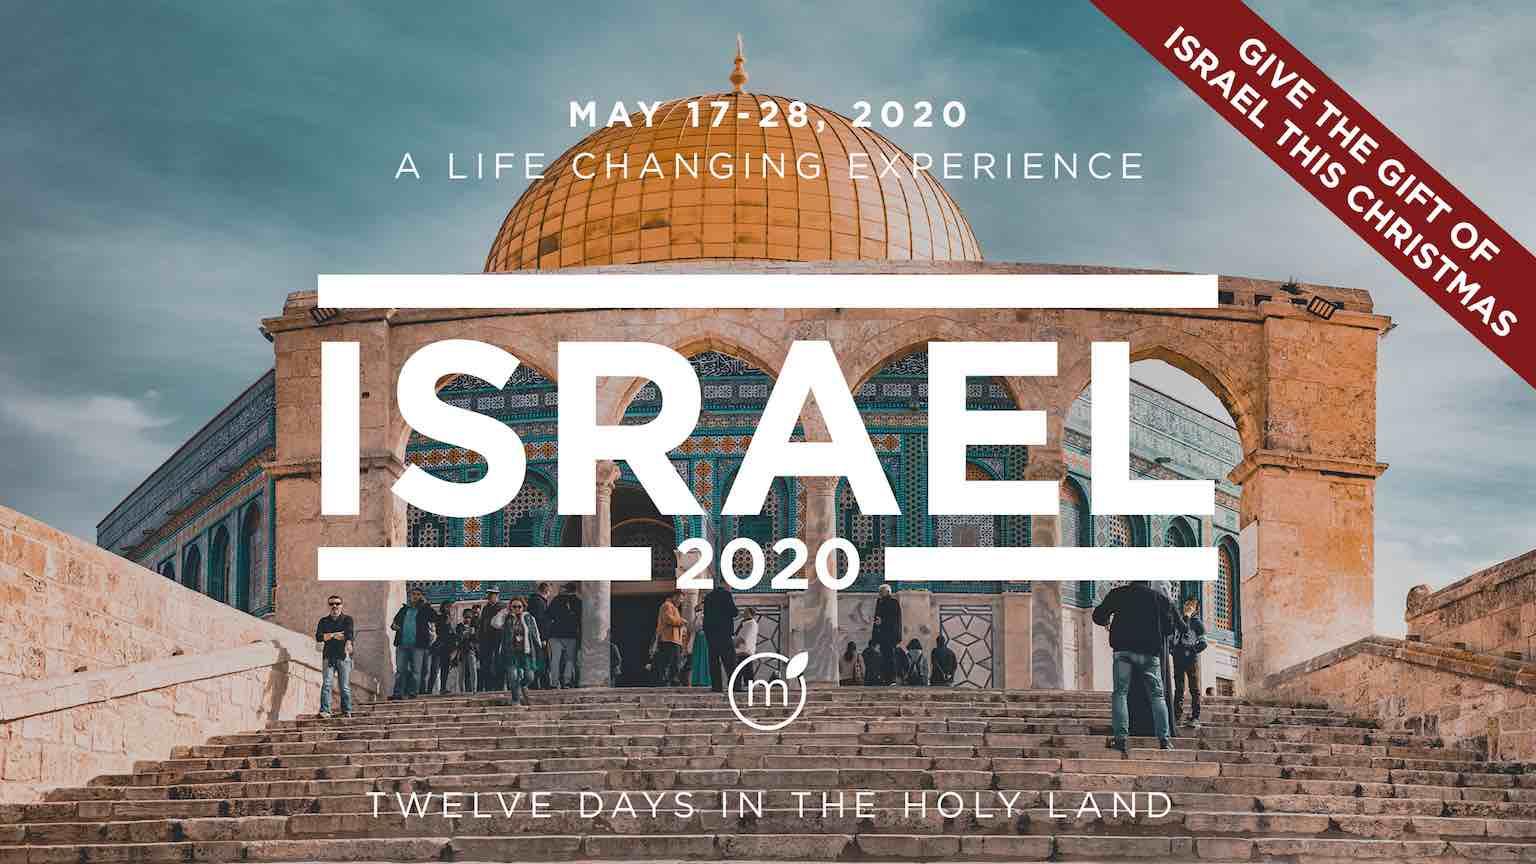 Israel, Holy Land, Israel Trip, 2020